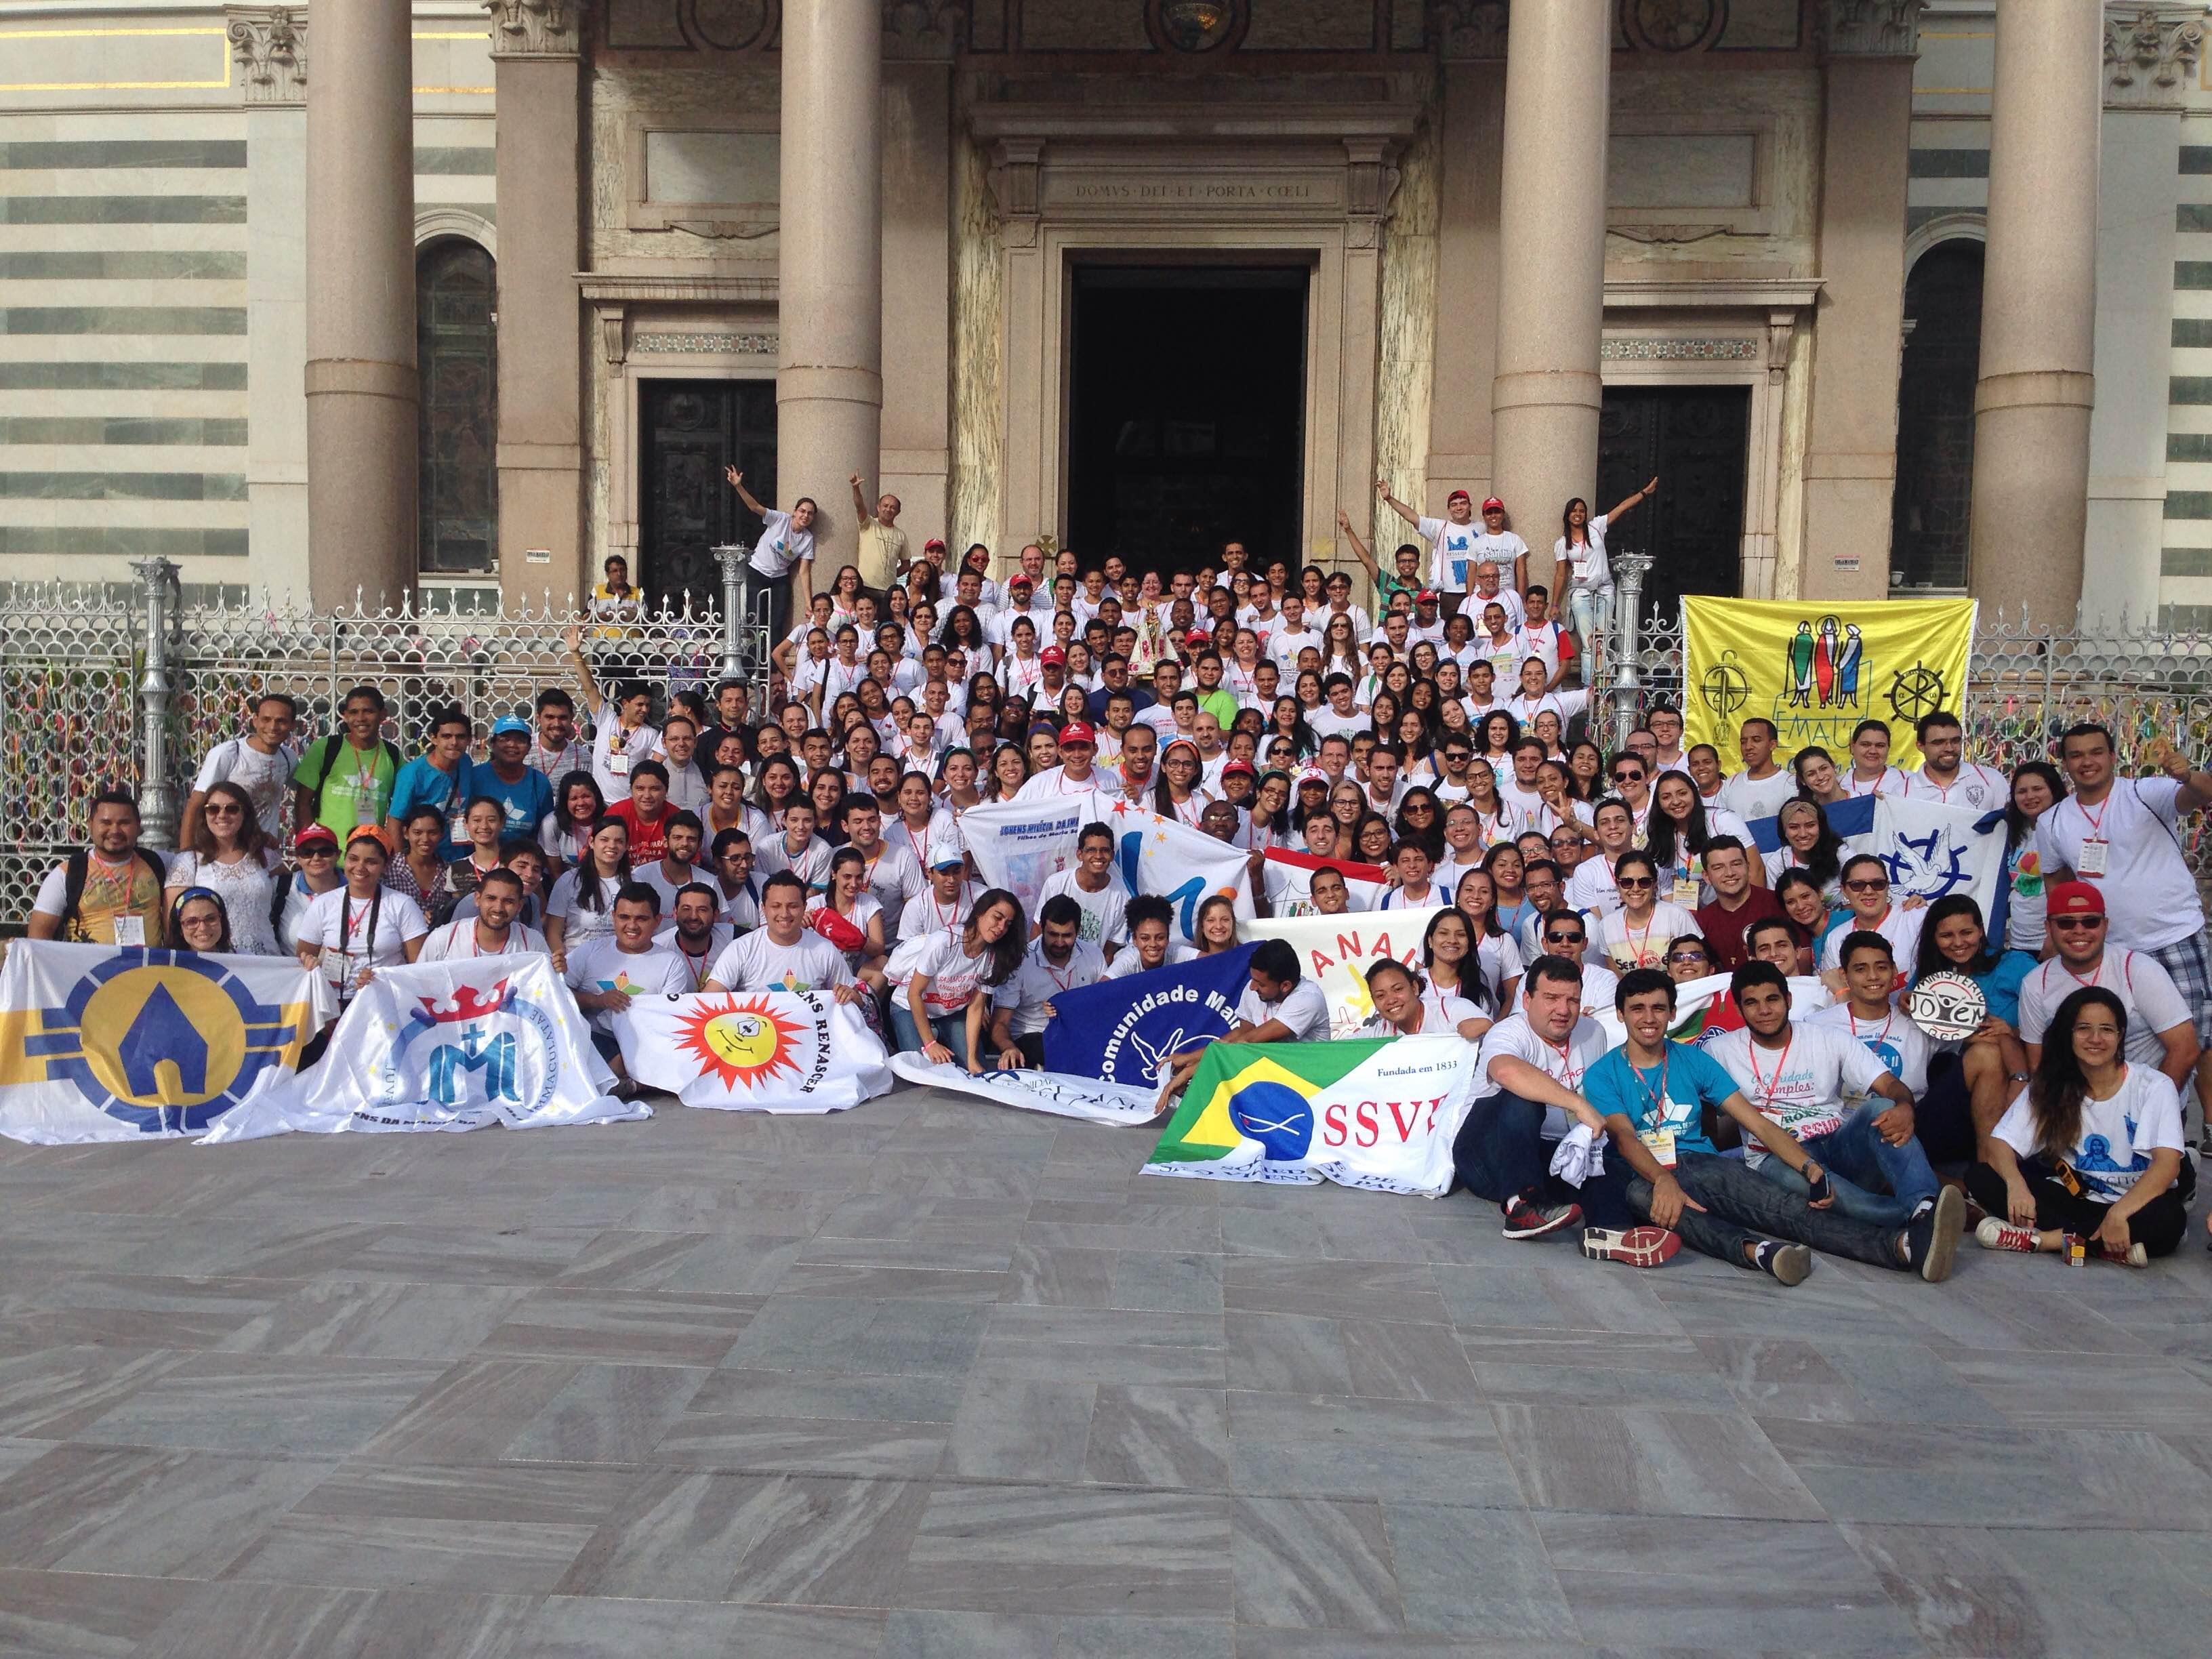 Papa Francisco irá receber carta dos participantes do Encontro Nacional de Jovens dos Movimentos e Novas Comunidades